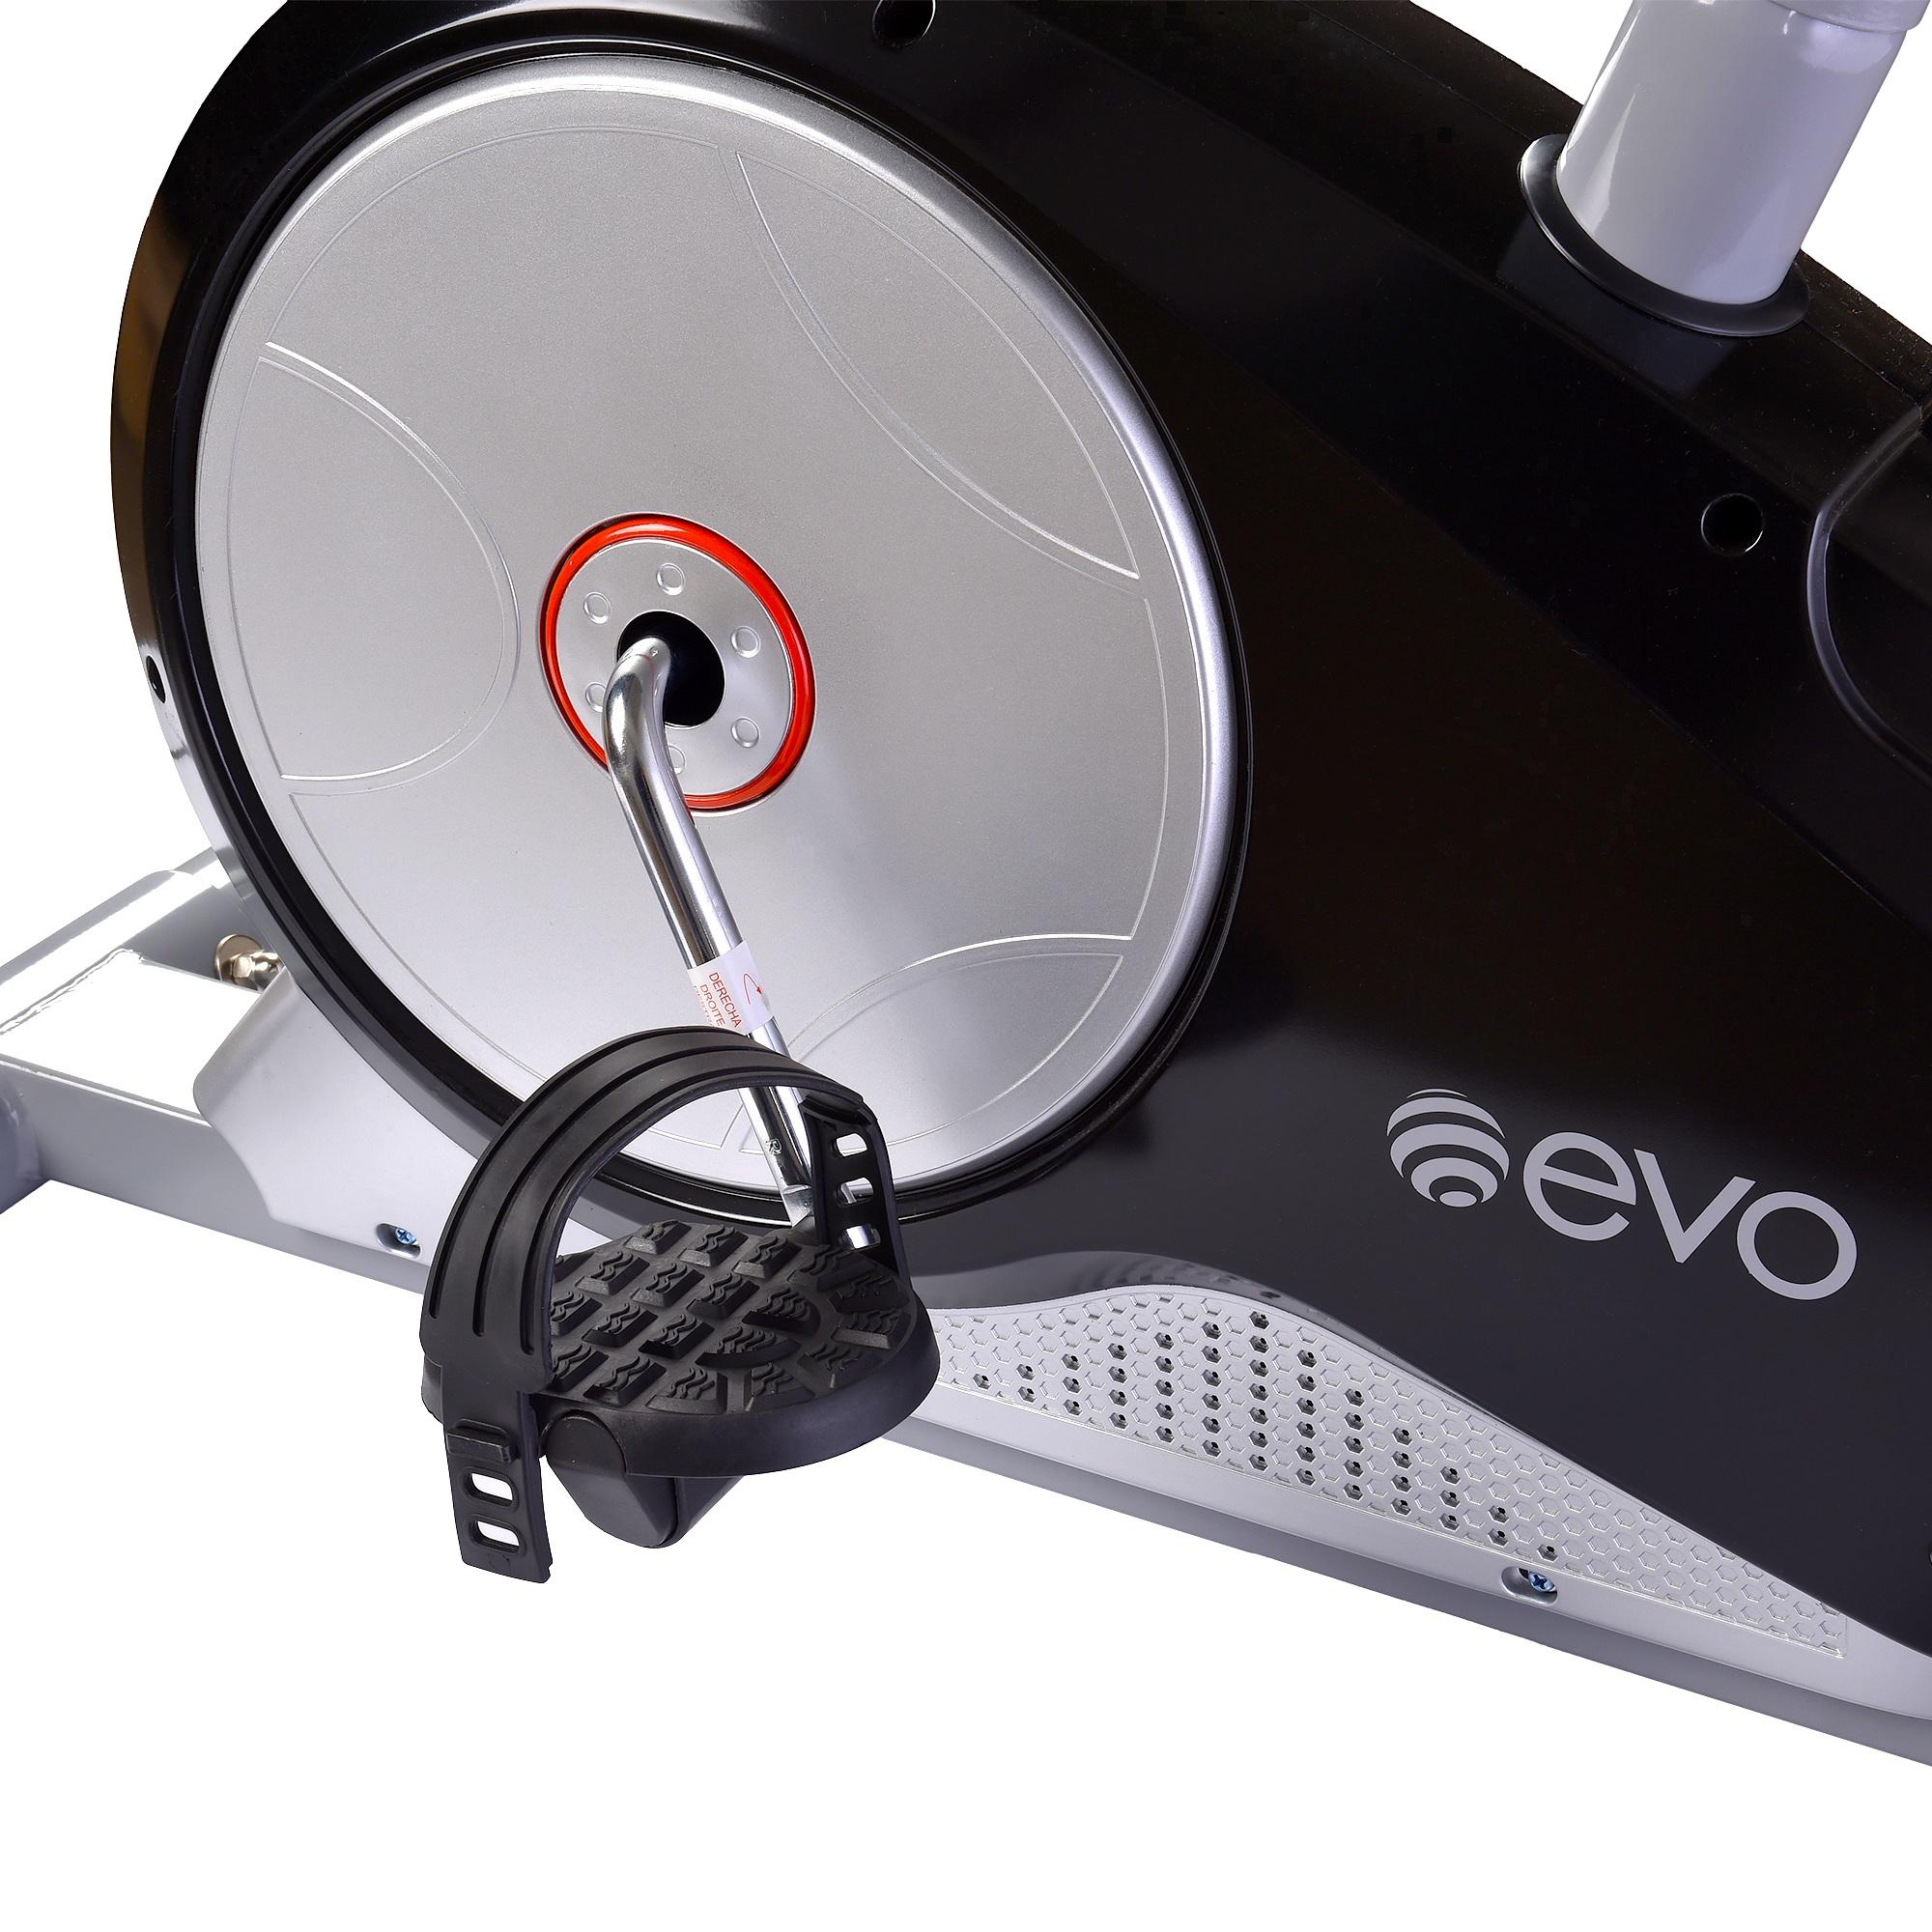 Велотренажер EVO FITNESS Crystal EL электромагнитный